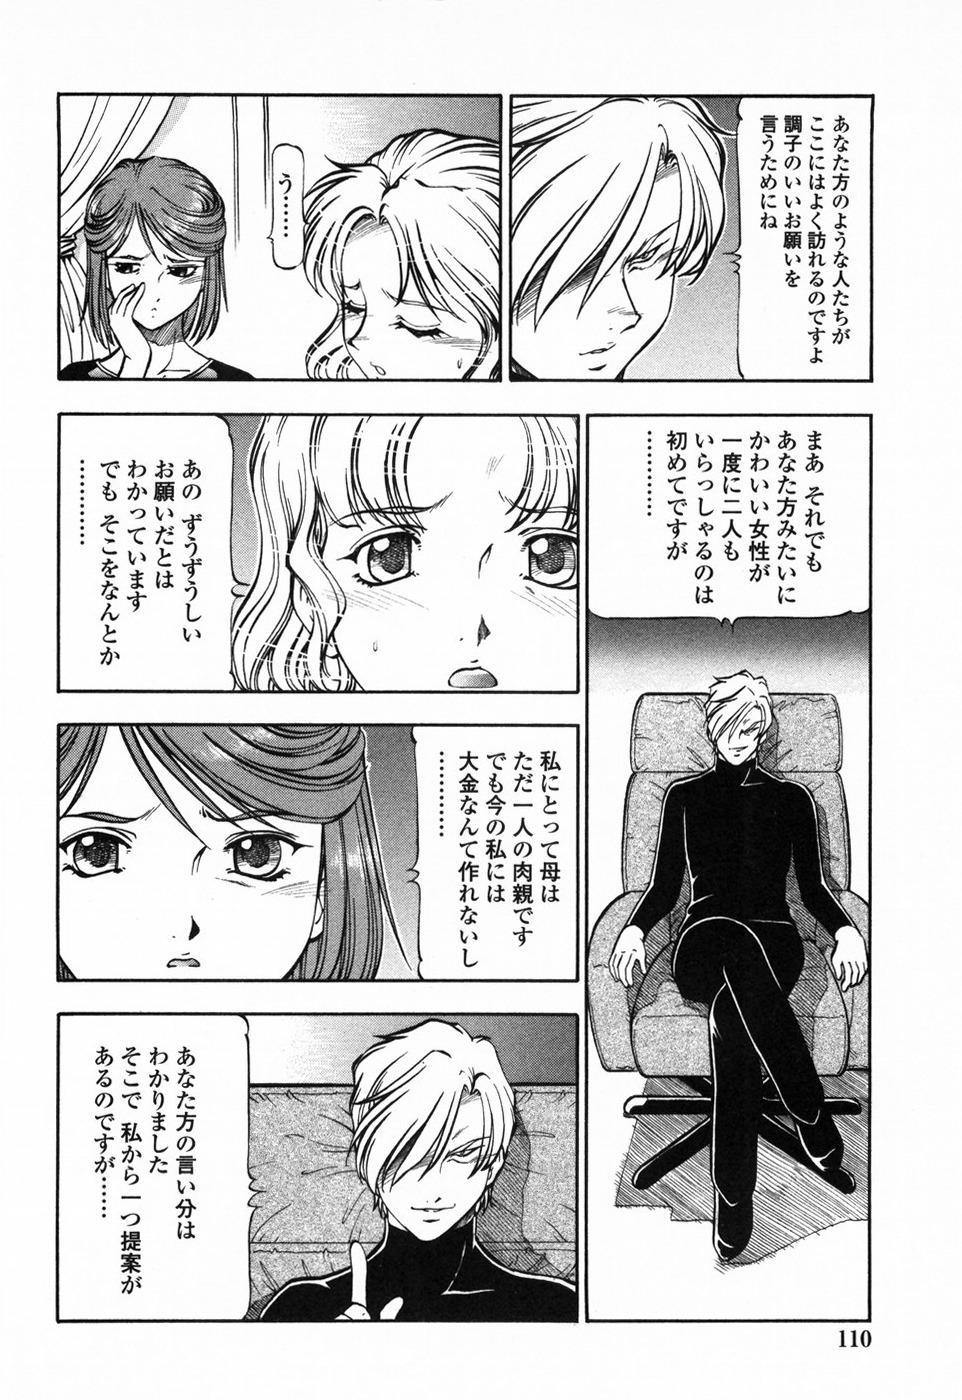 Kichiku Houteishiki - Equation of brutal person 116